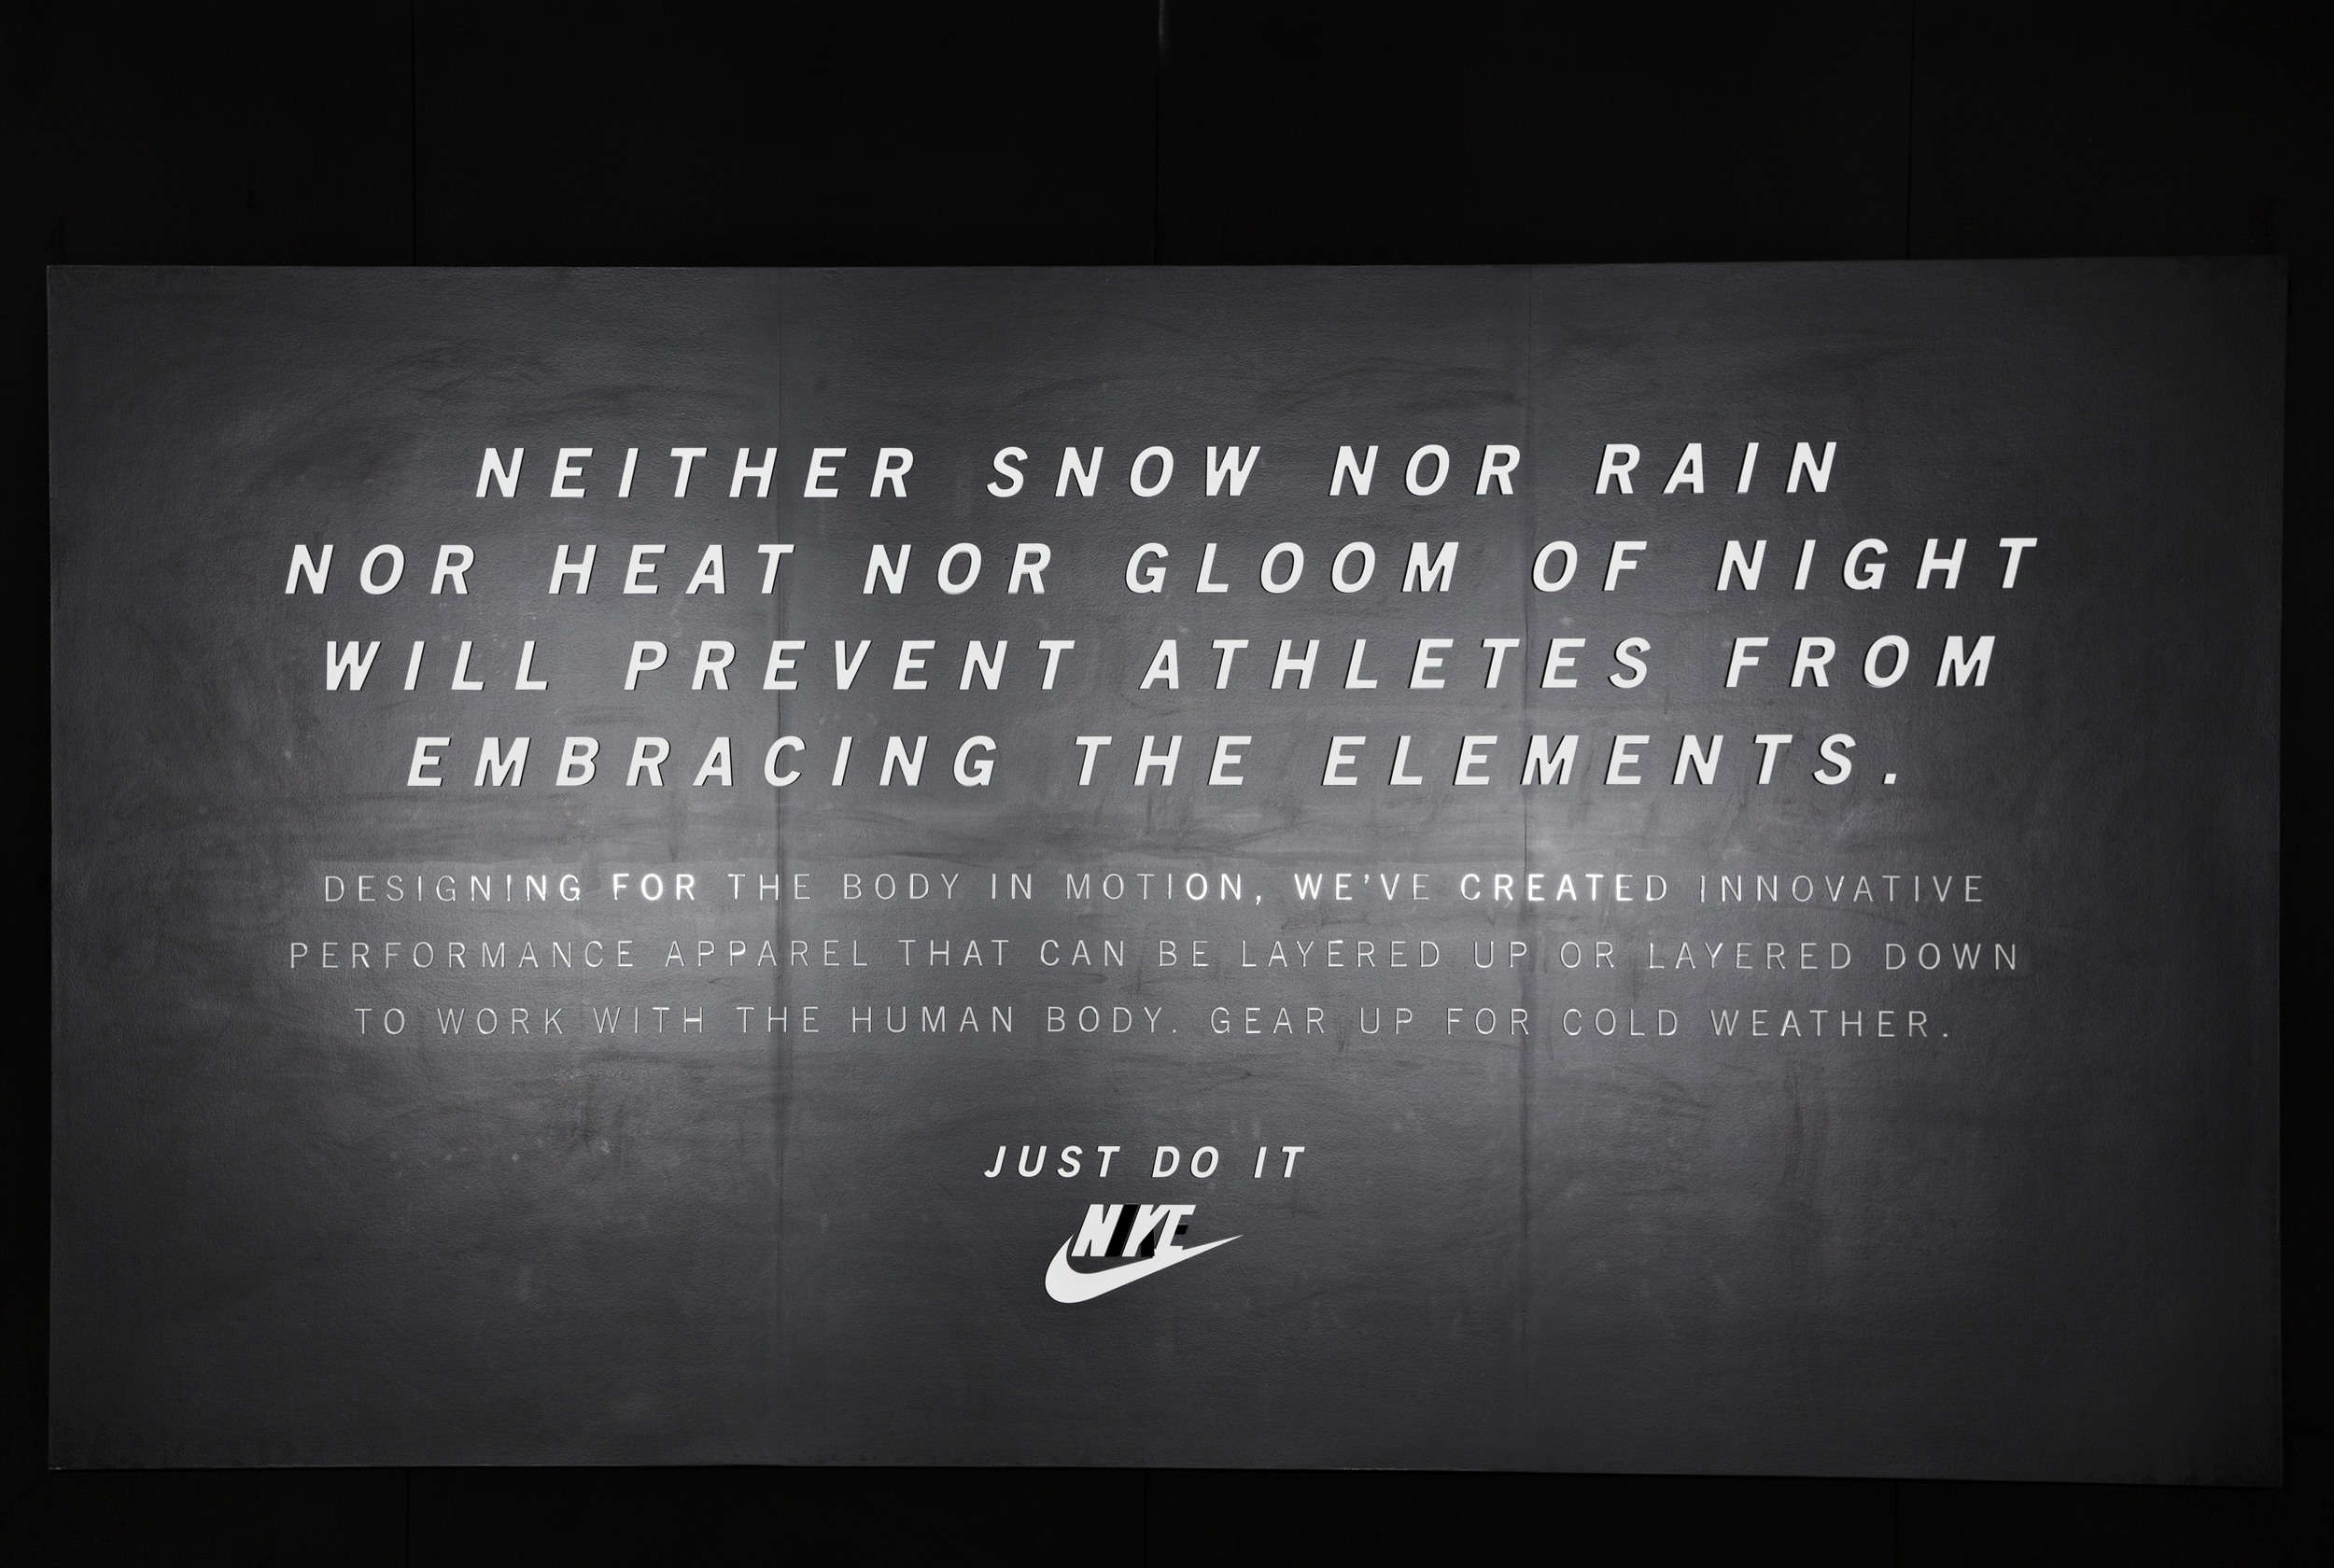 f-w_JDI-NYC_Nike_9552.jpg